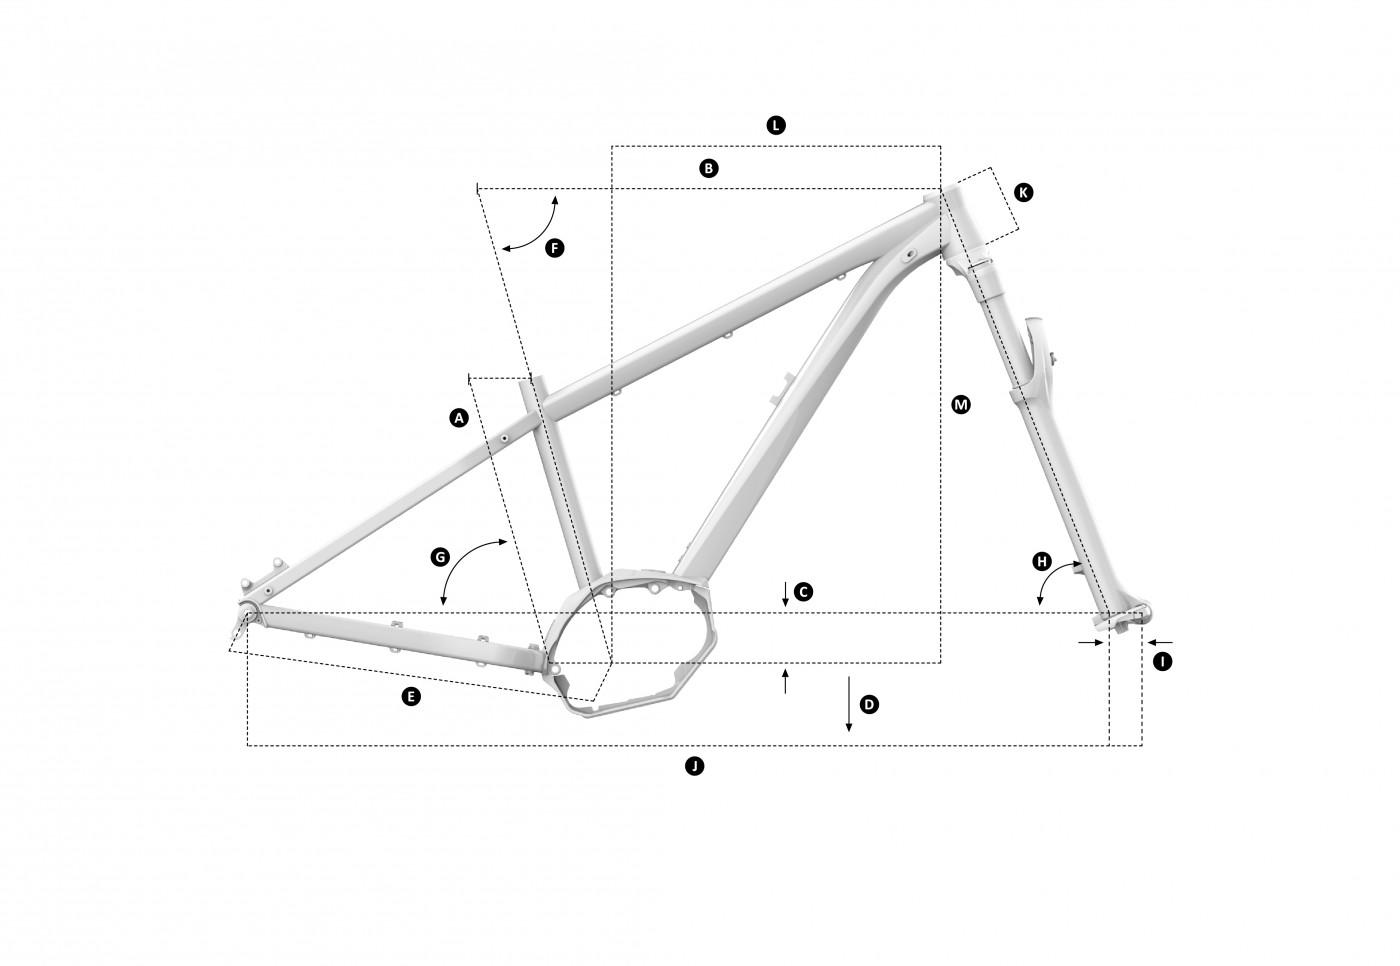 panzer-r-20180719161453-geometry_1400_10